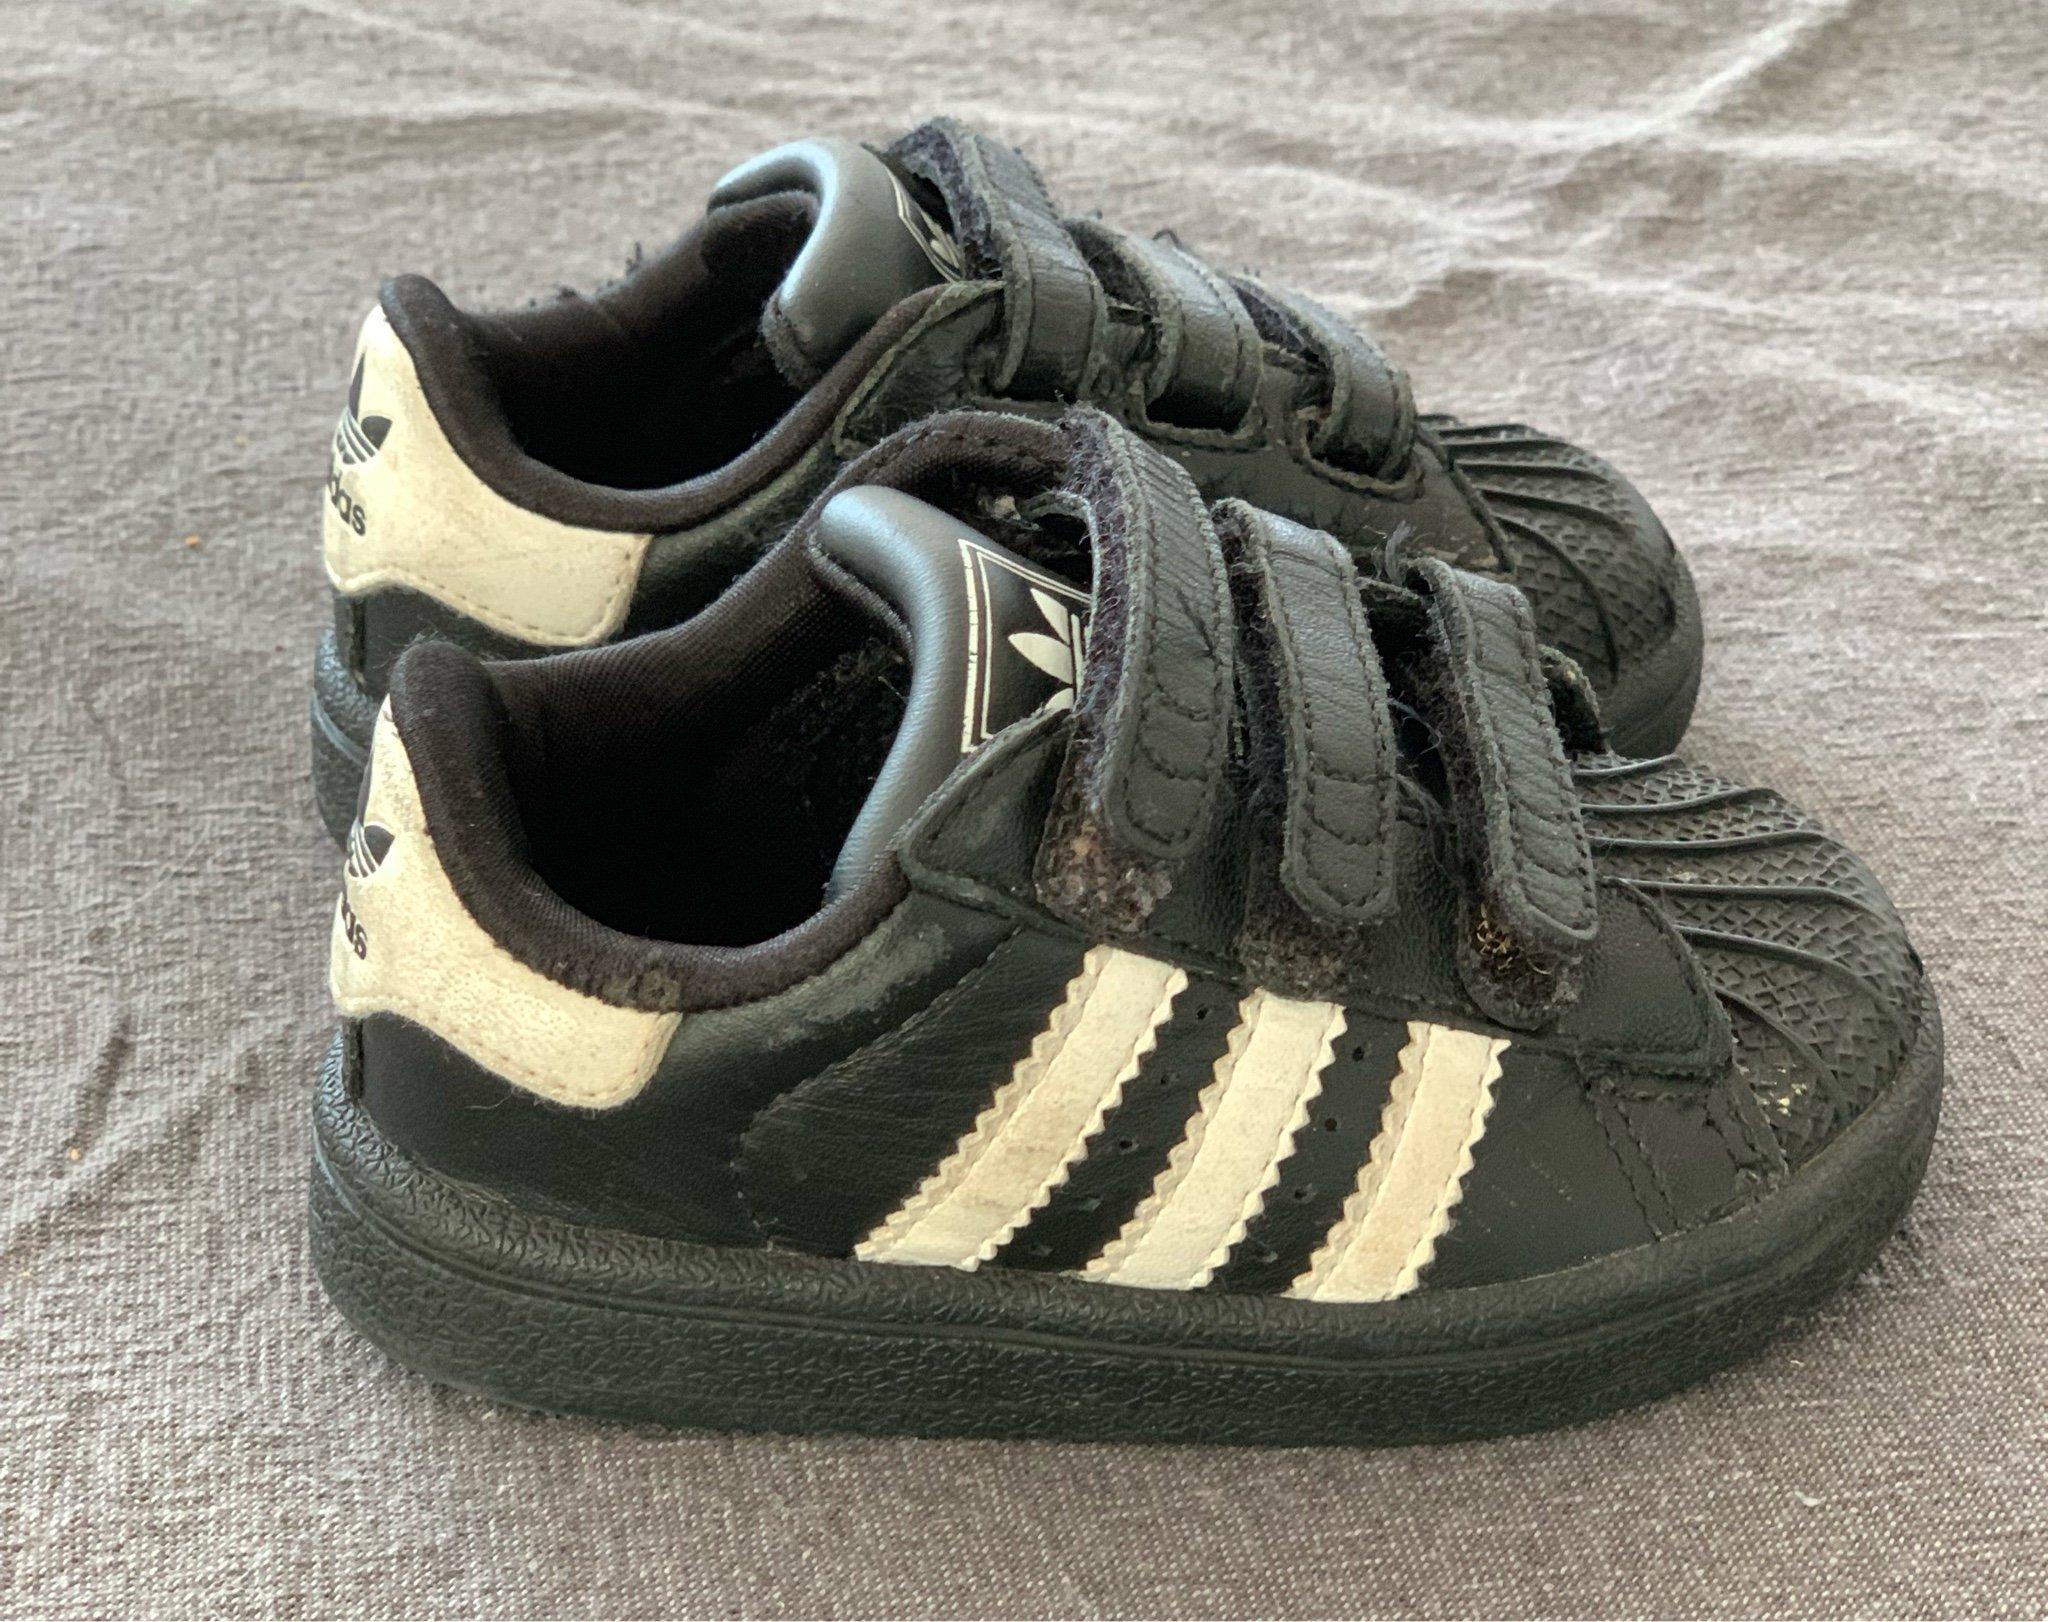 fina Adidasskor storlek 19